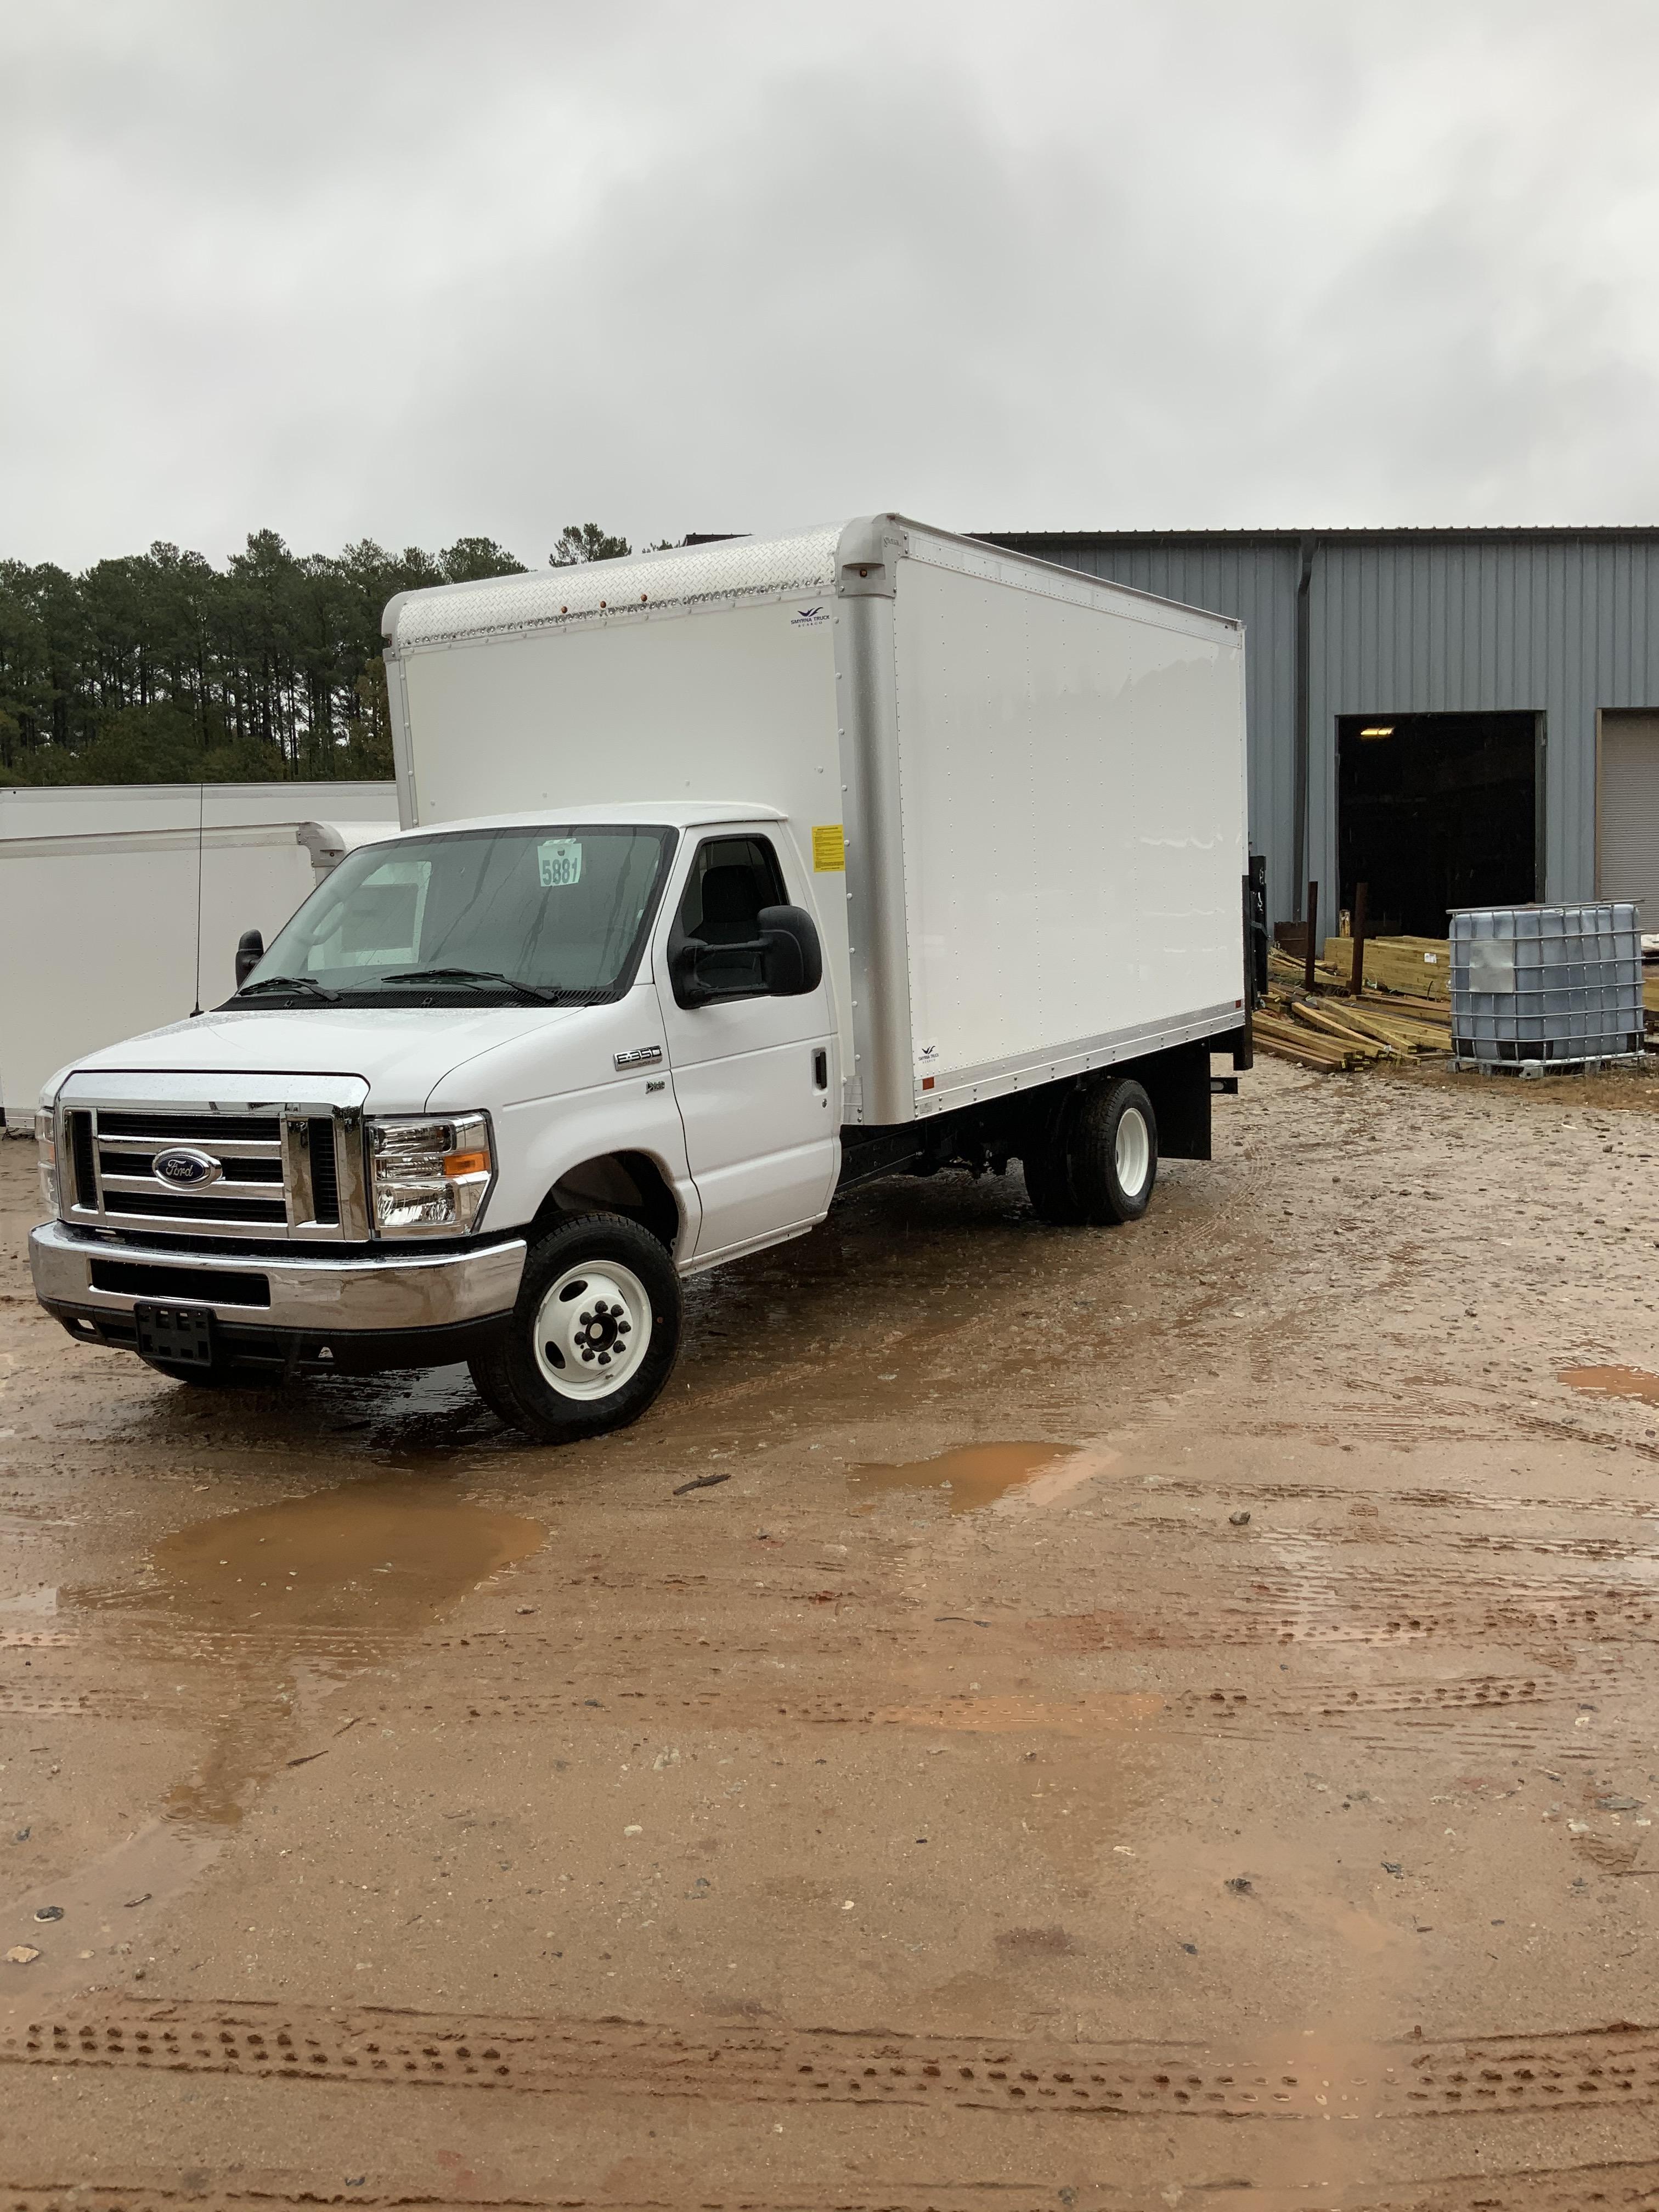 New 2019 Ford E-350 Cutaway Van for sale in Savannah. GA | #4965